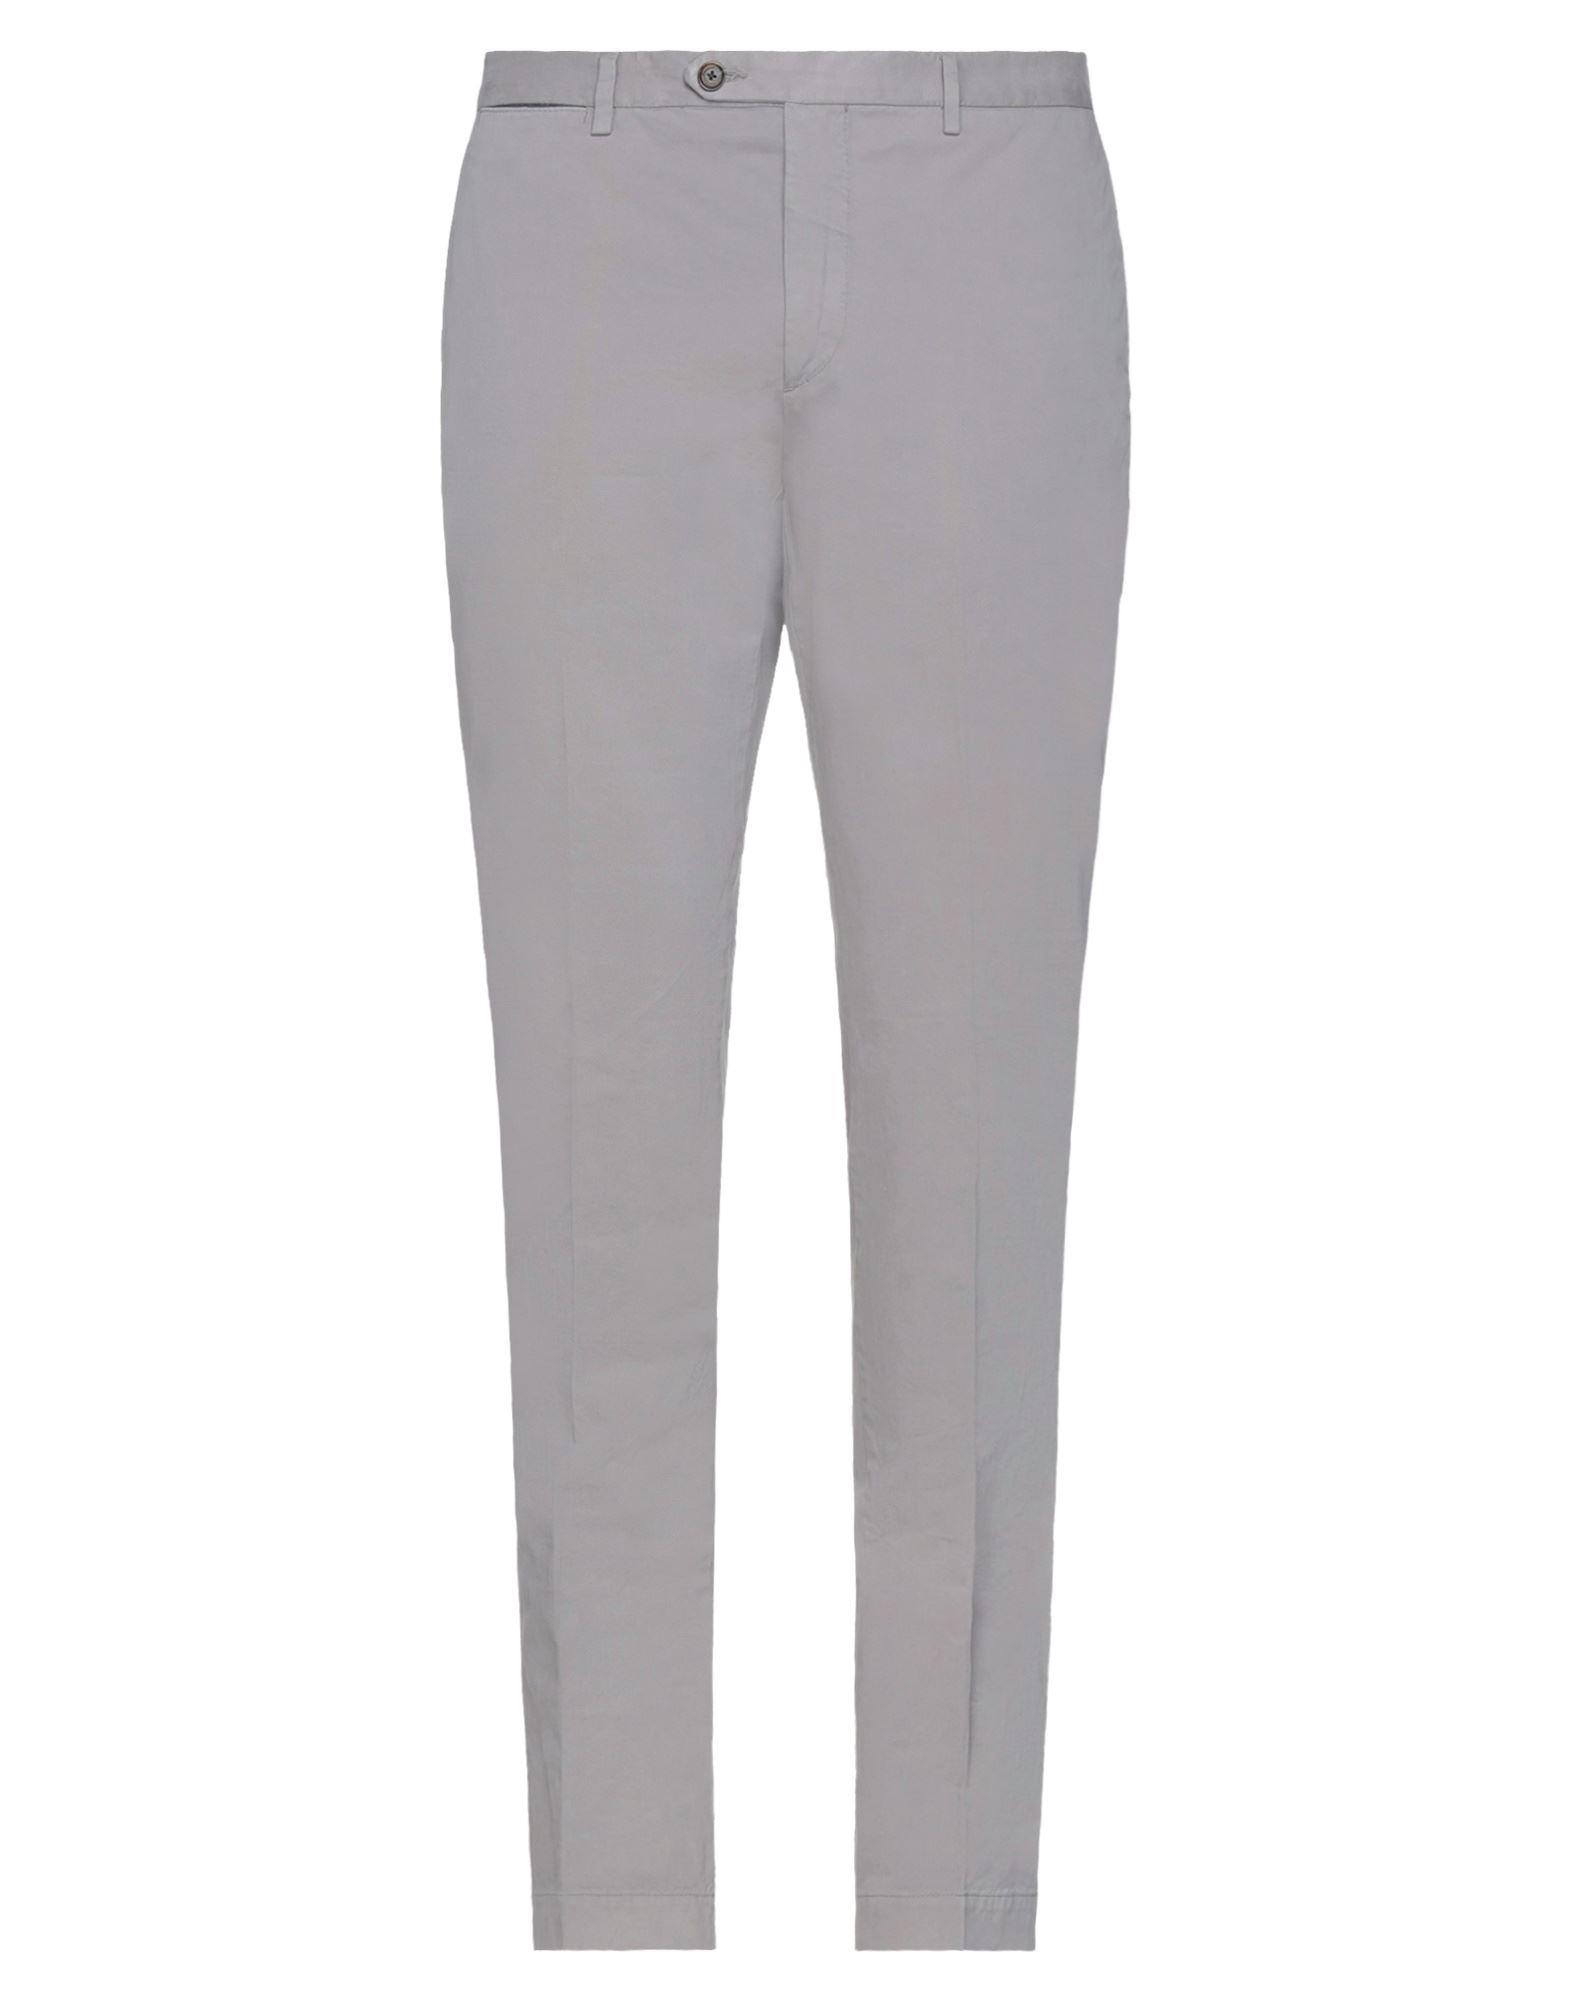 Hackett Casual Pants In Gray